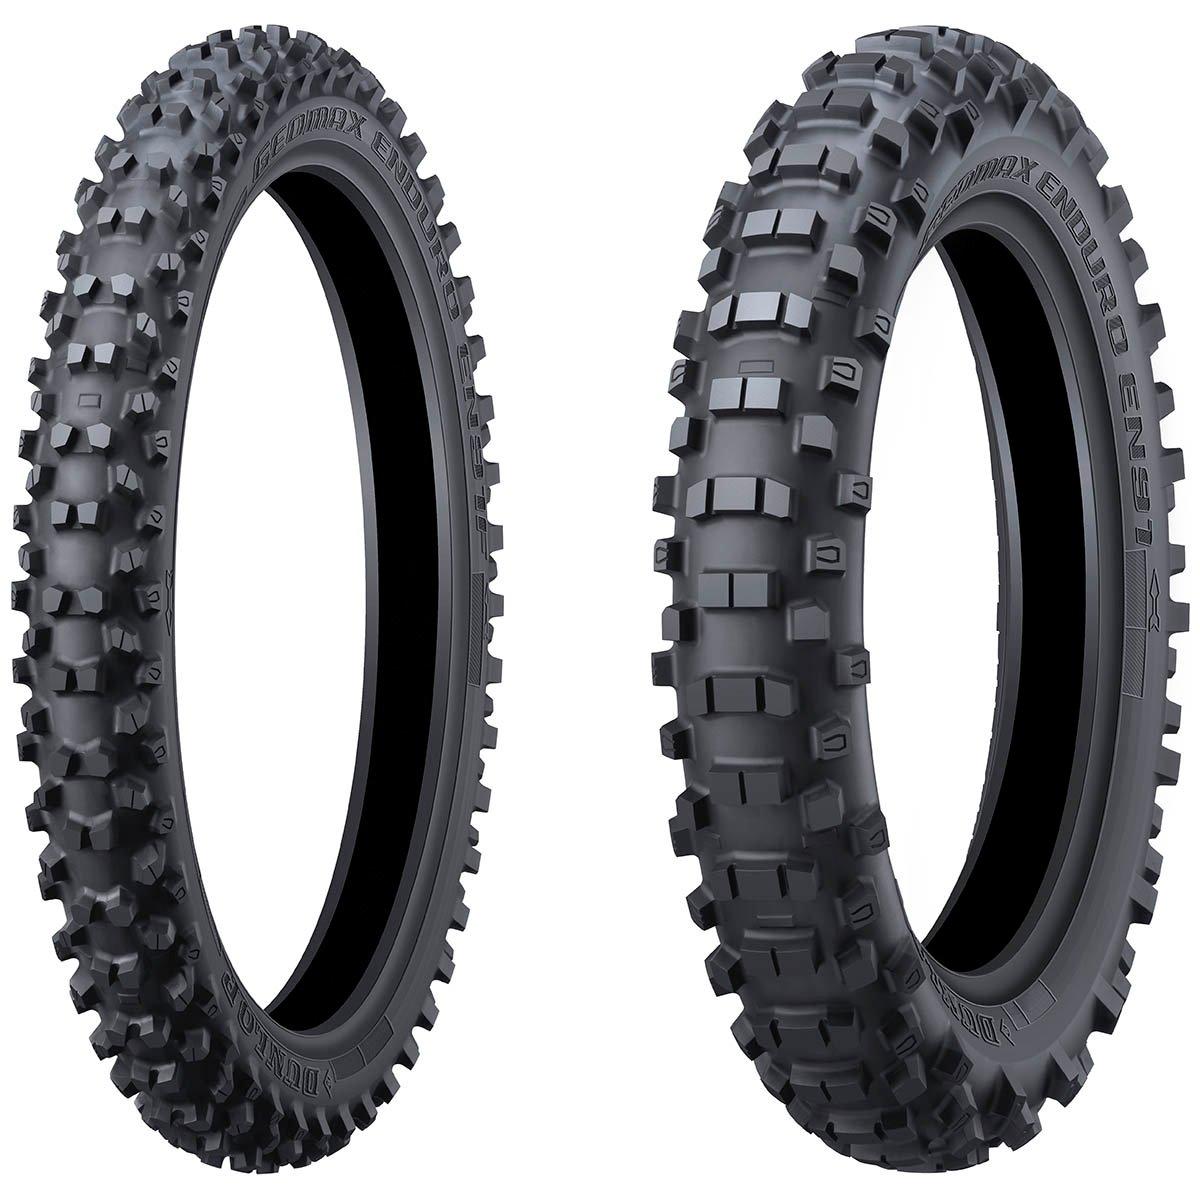 Dunlop Geomax Enduro EN91 Tires front/rear